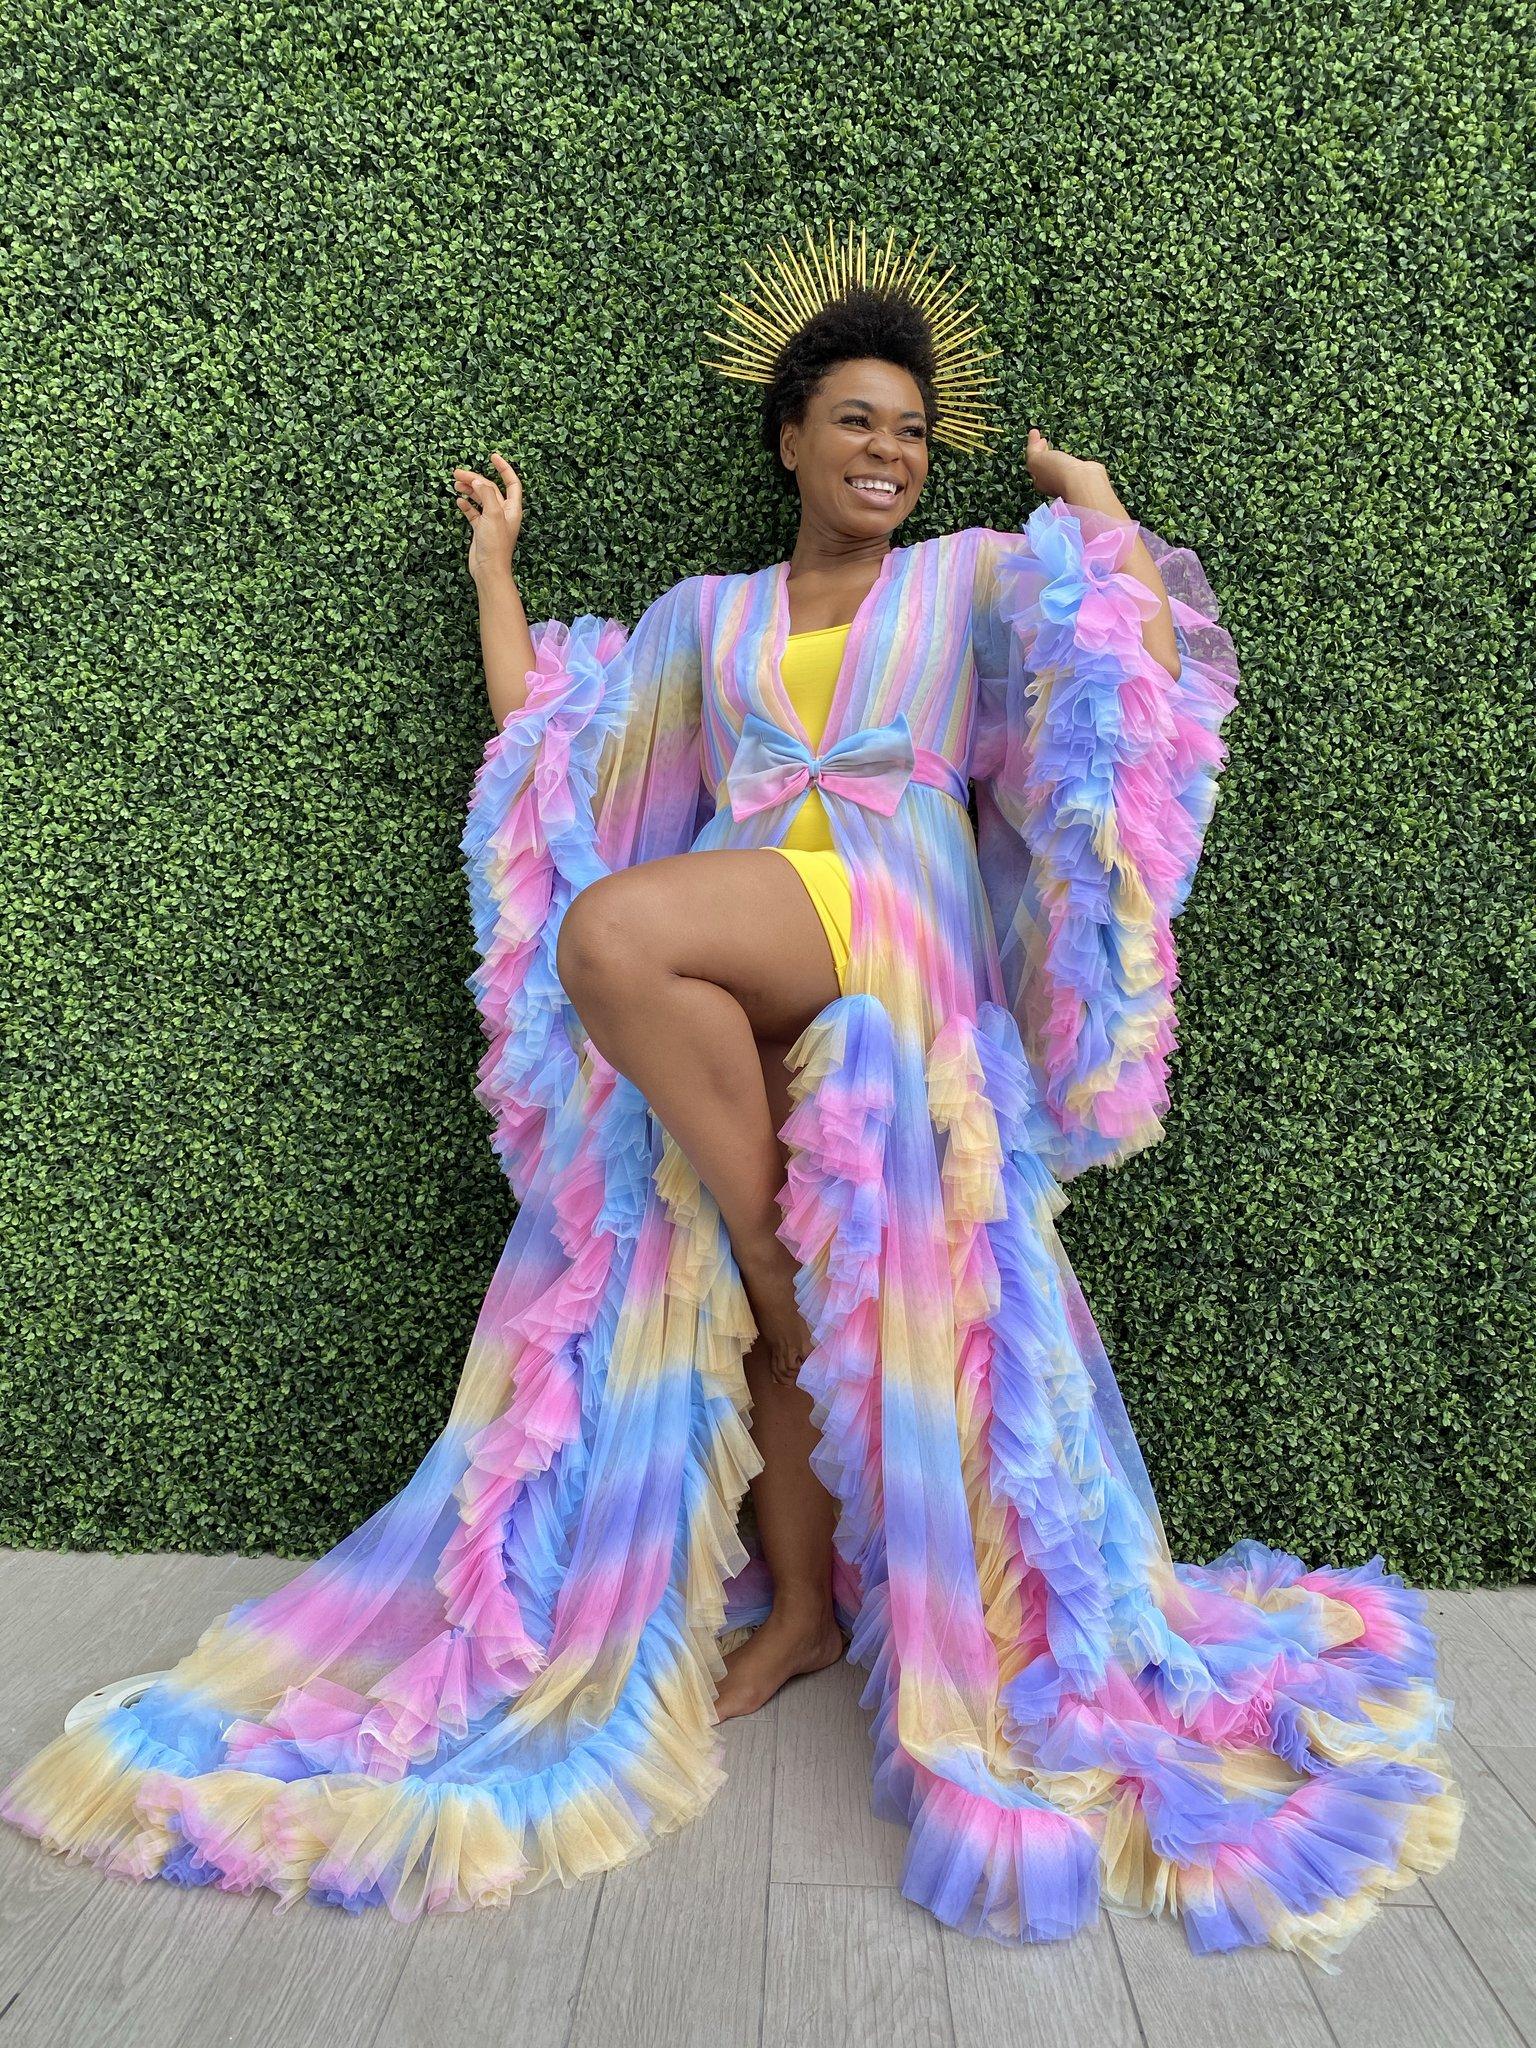 Lingerie Of The Week Oyemwen Candy Rainbow Tulle Robe